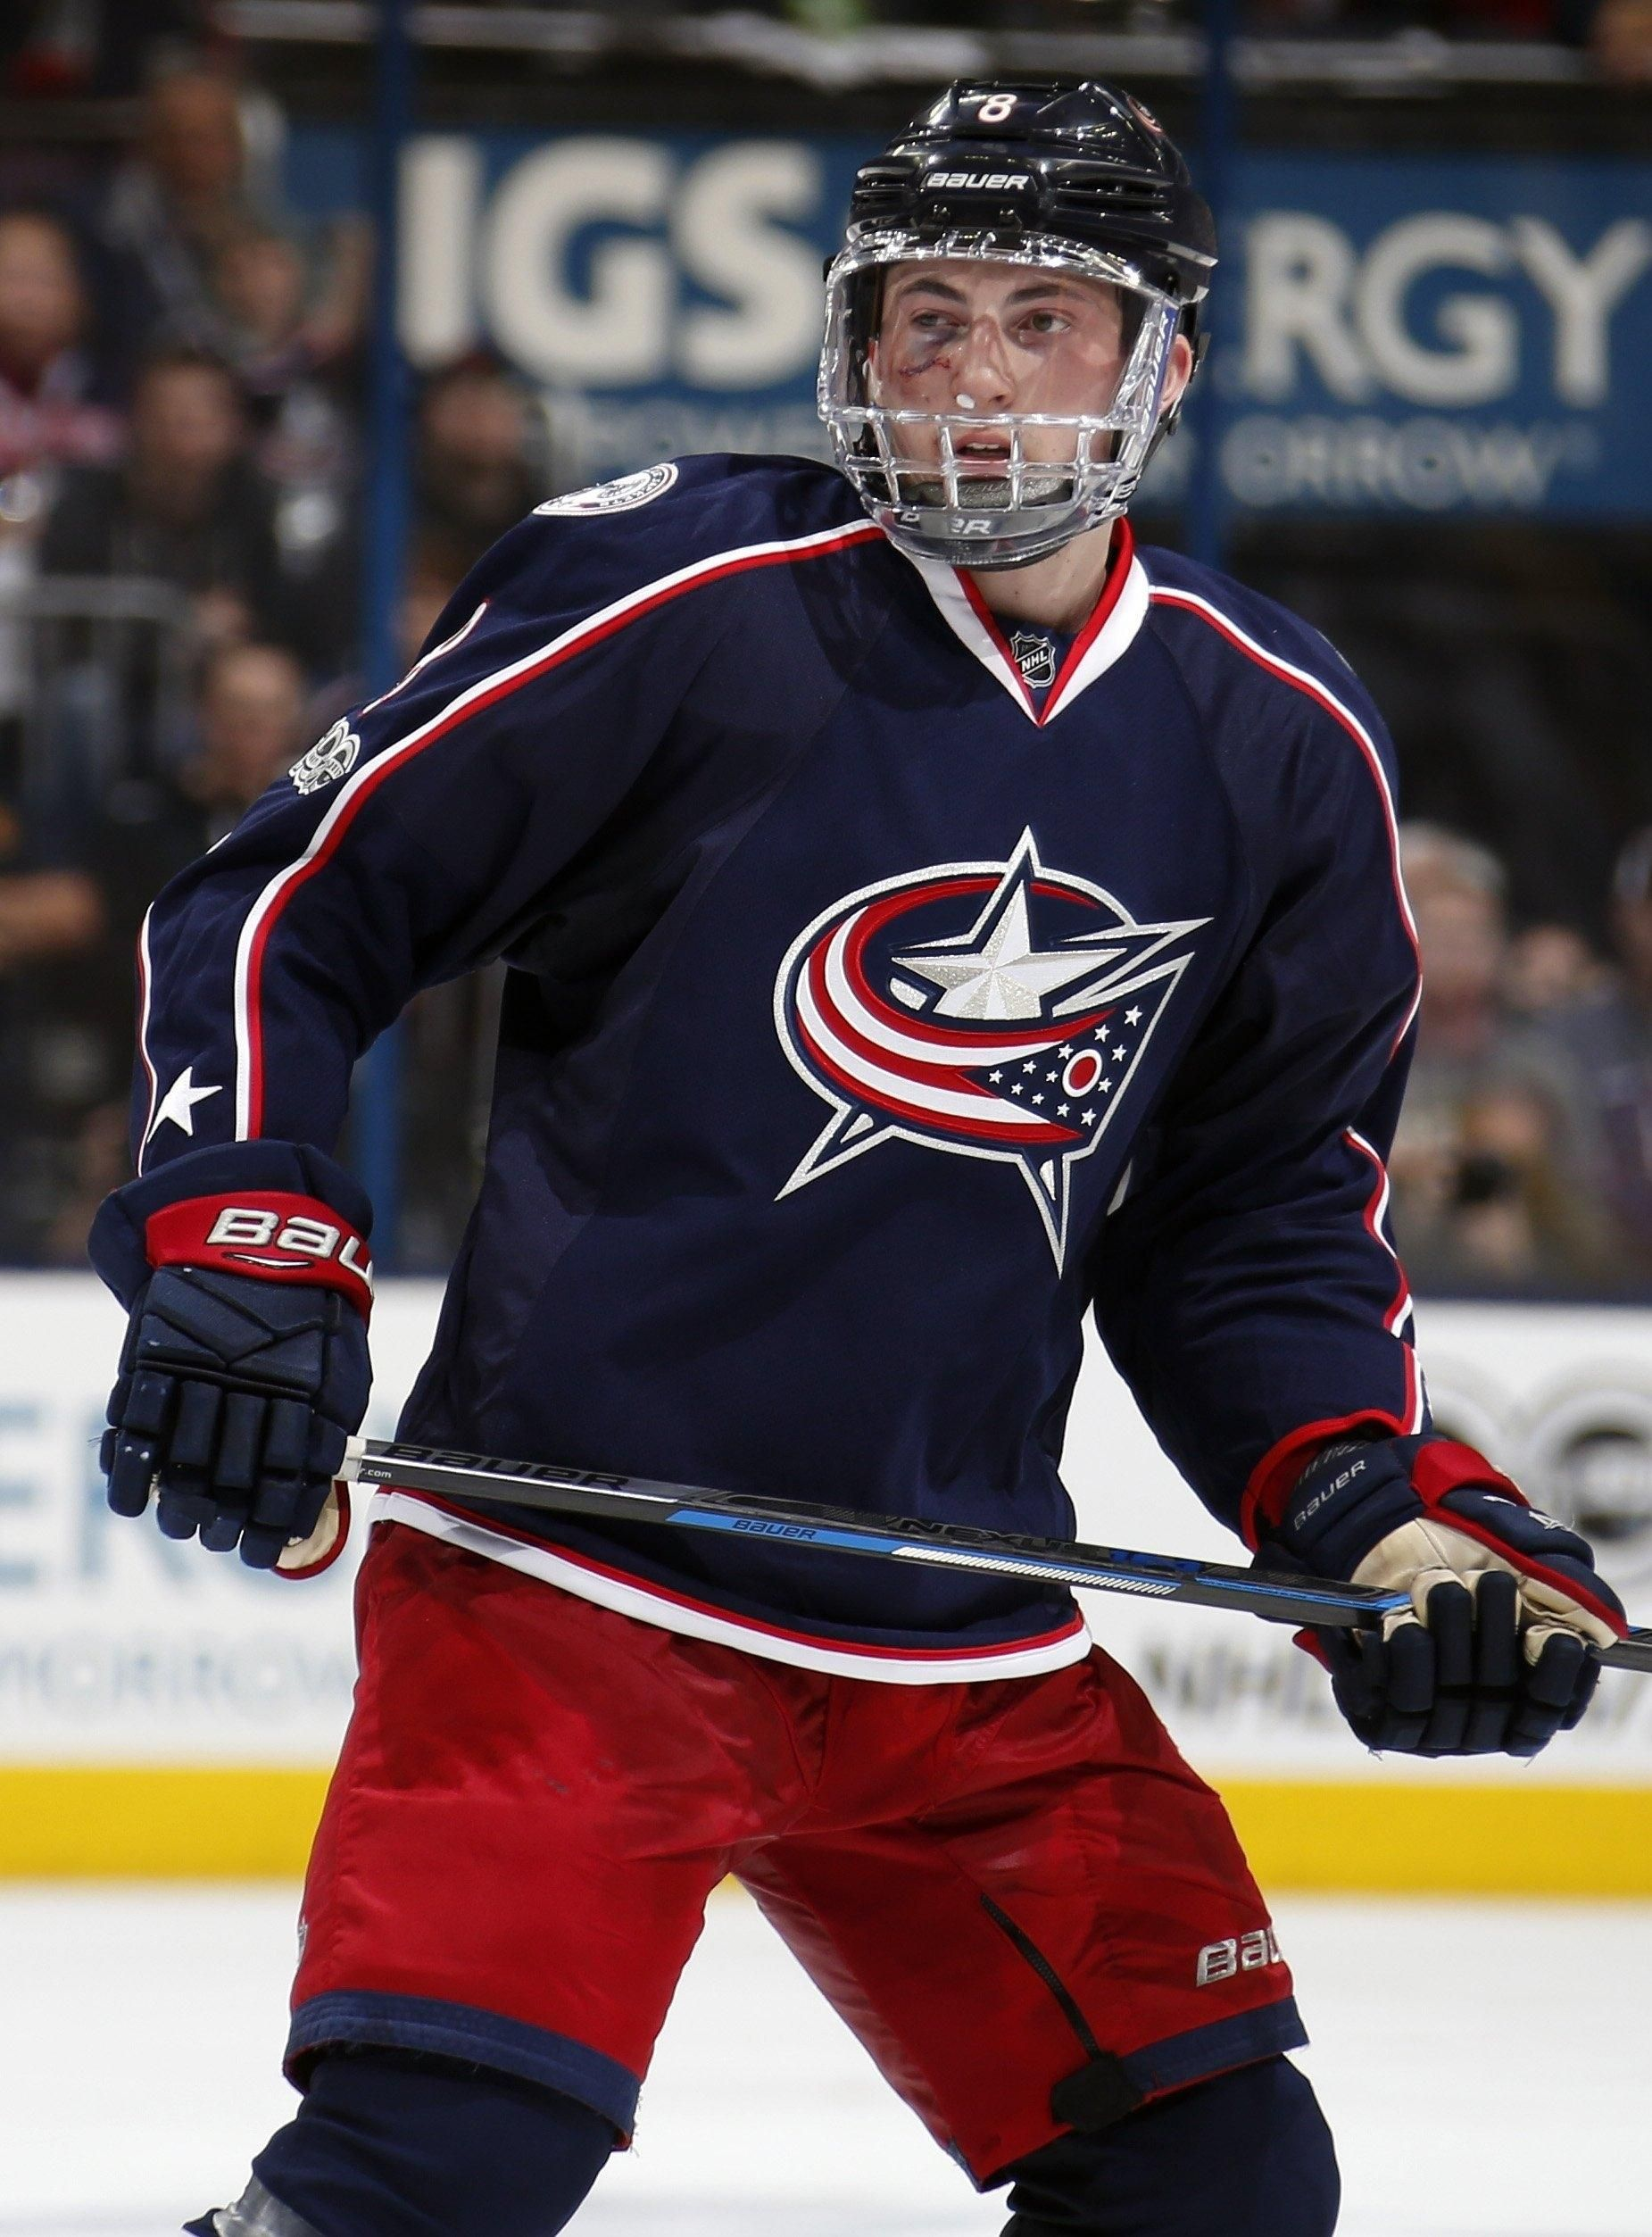 Blue Jackets | Injured Zach Werenski out for postseason - The ...